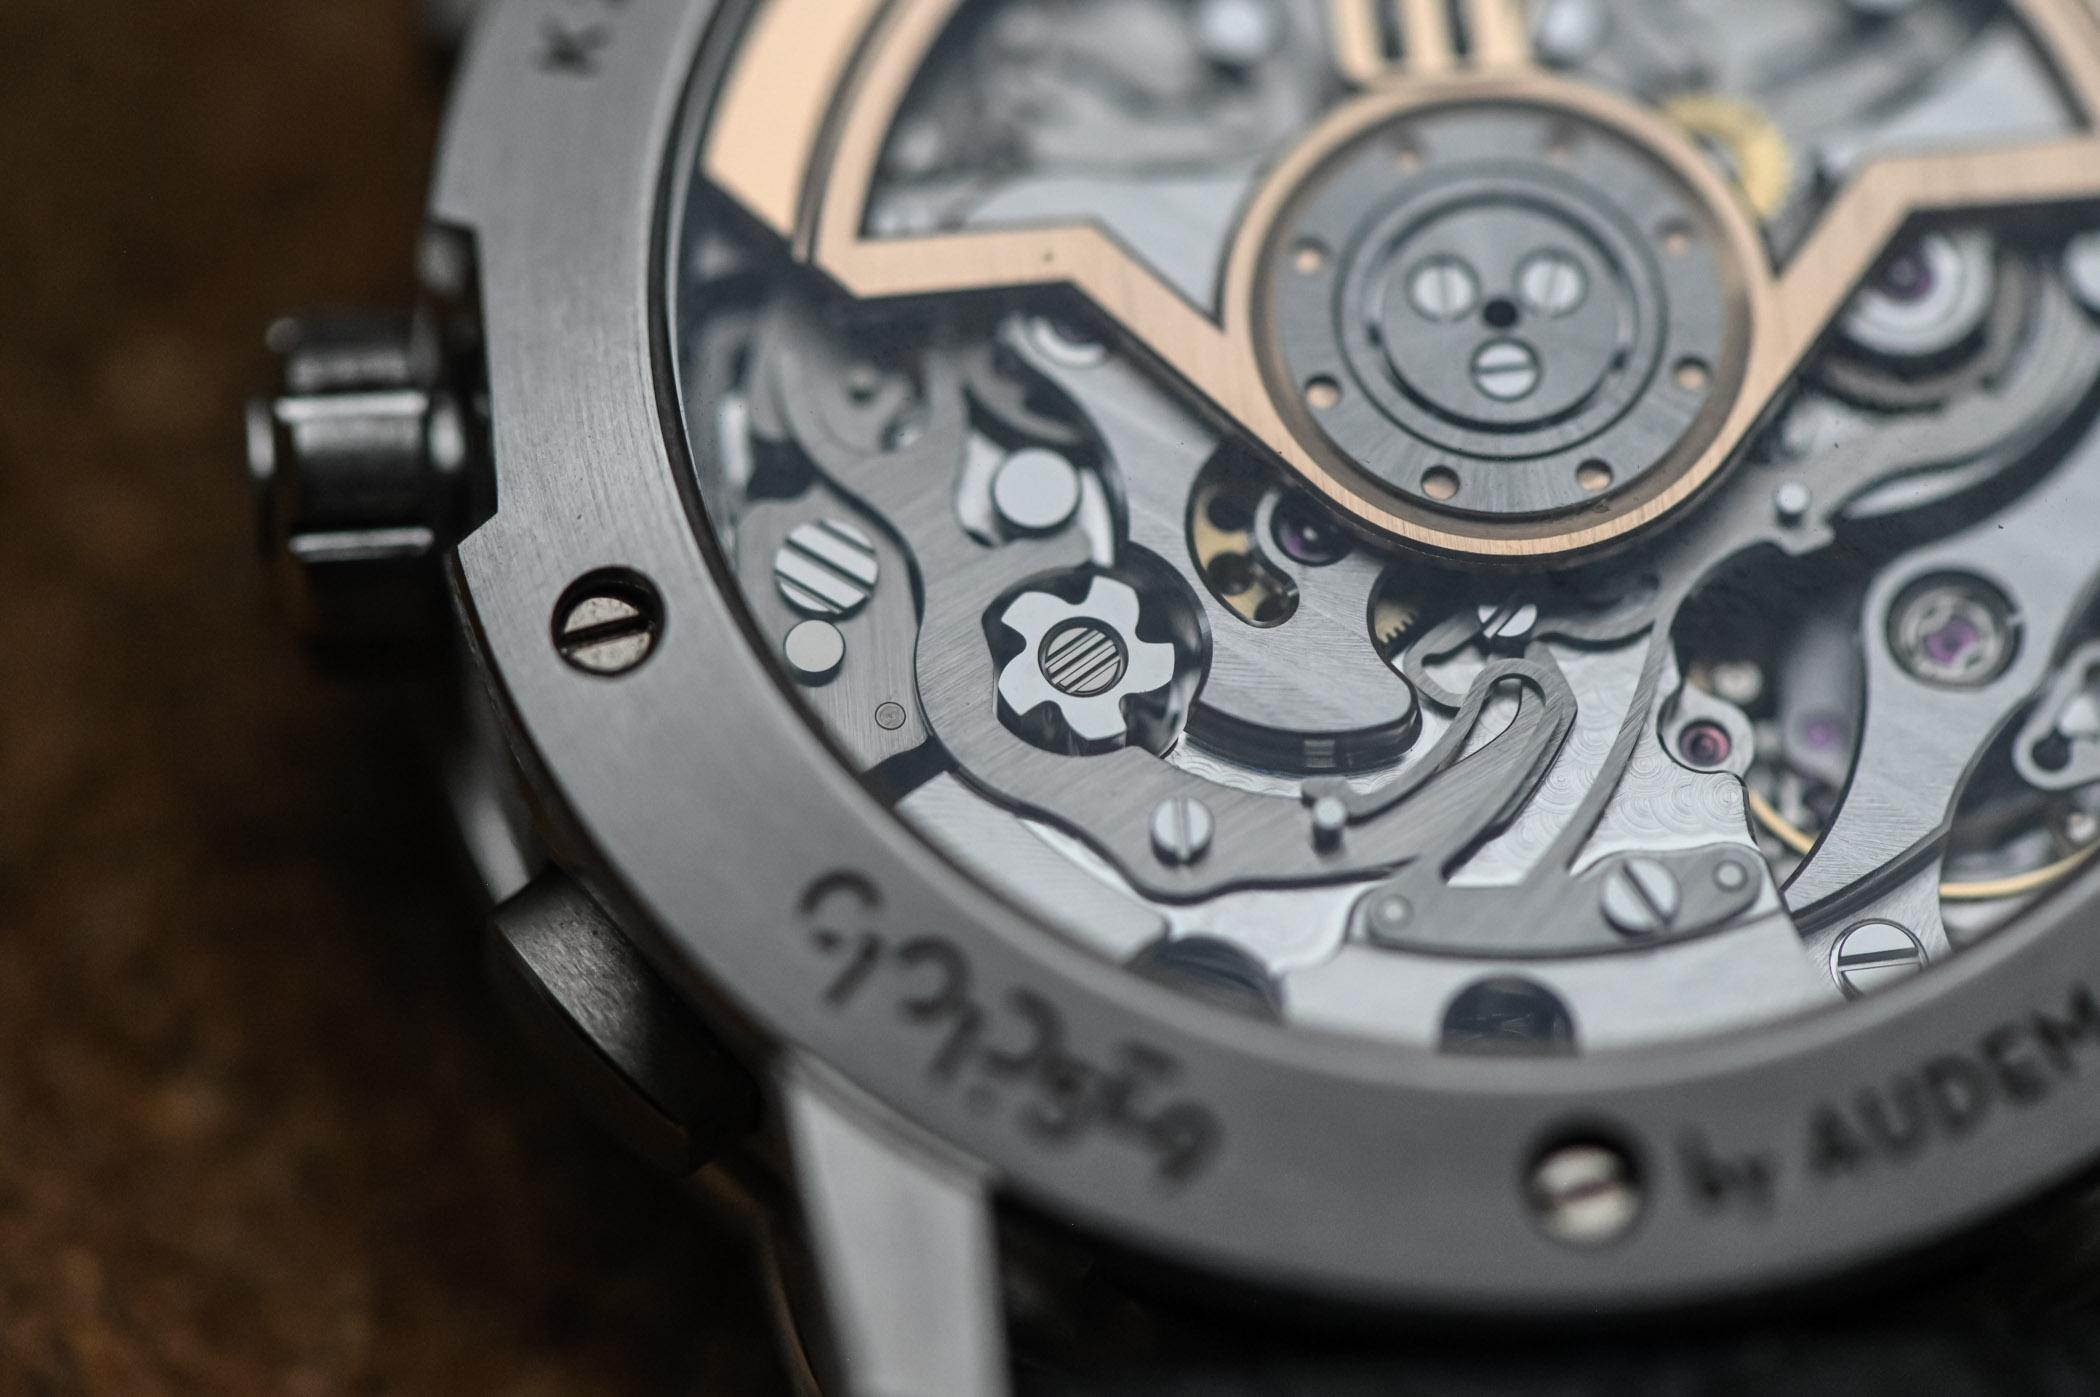 Code 11.59 by Audemars Piguet Selfwinding Chronograph Review Calibre 4401